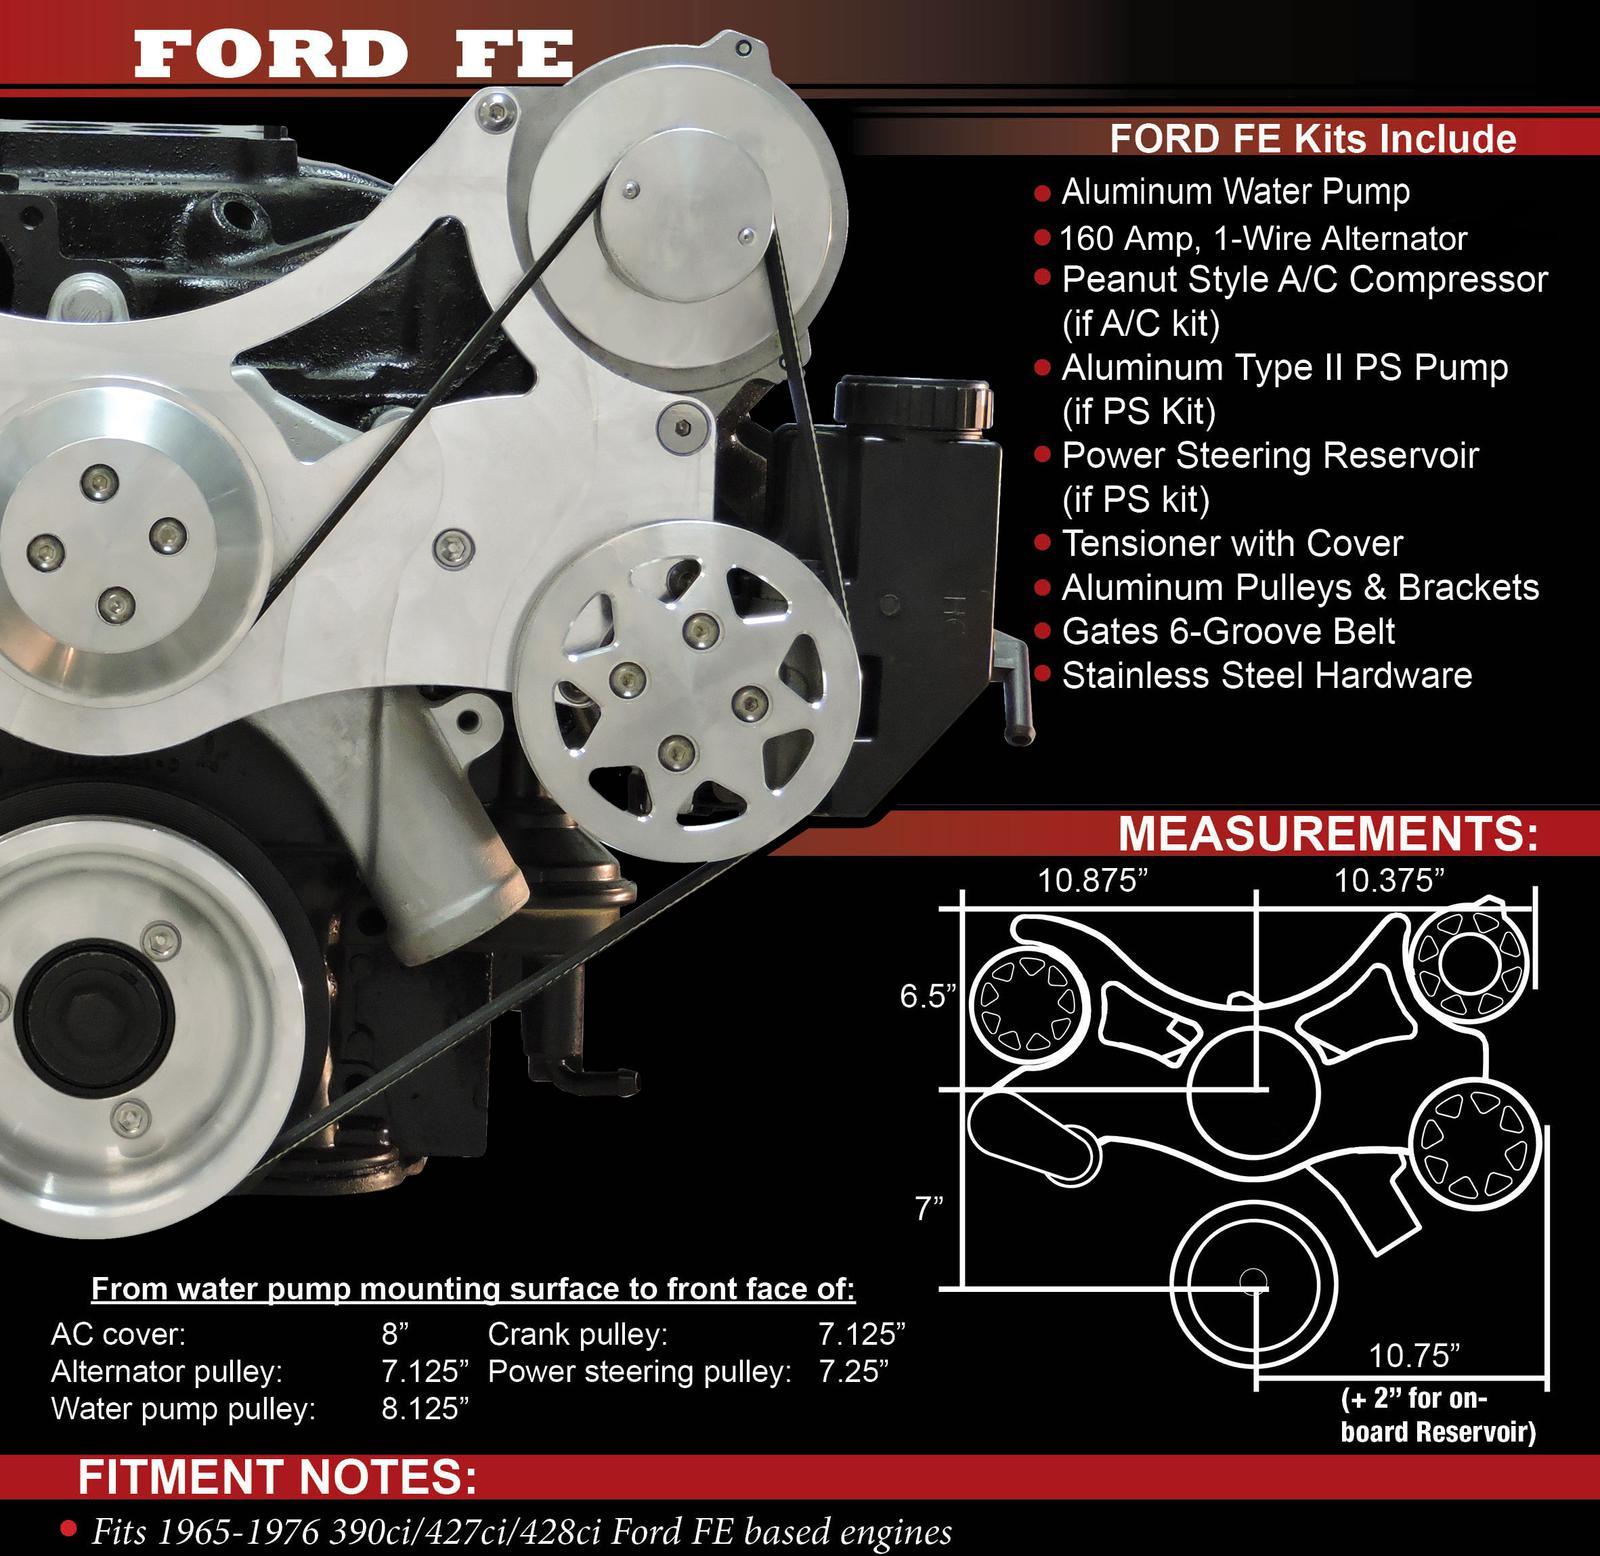 1971 Ford F100 390 Alternator Wiring Electrical Diagrams 1965 1981